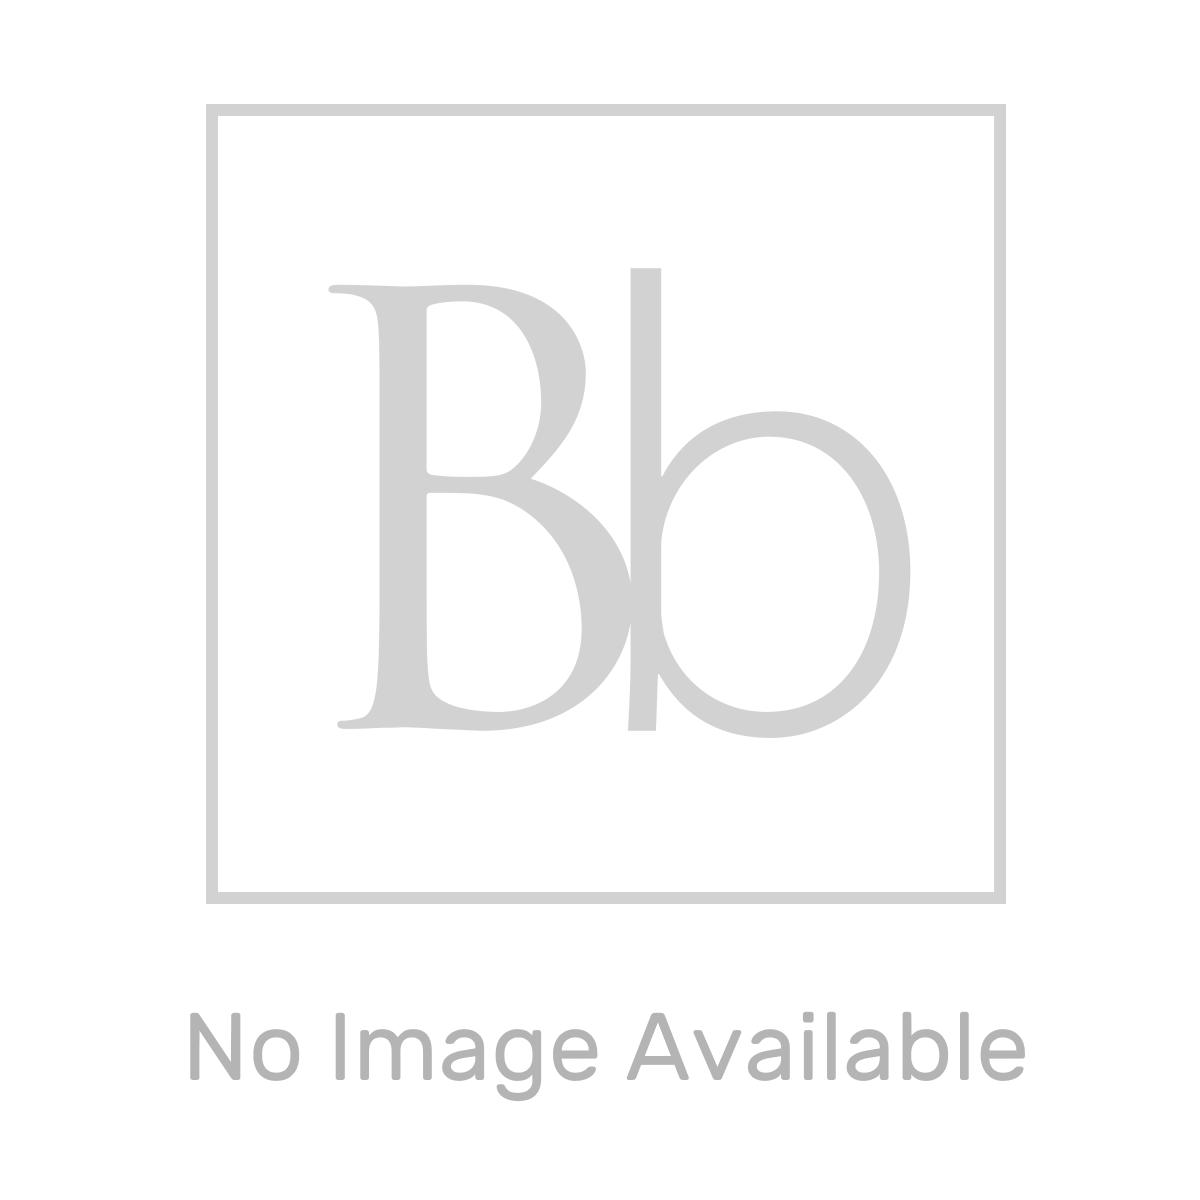 Elation Eko Graphite Gloss Mirror Wall Unit 750mm Measurements